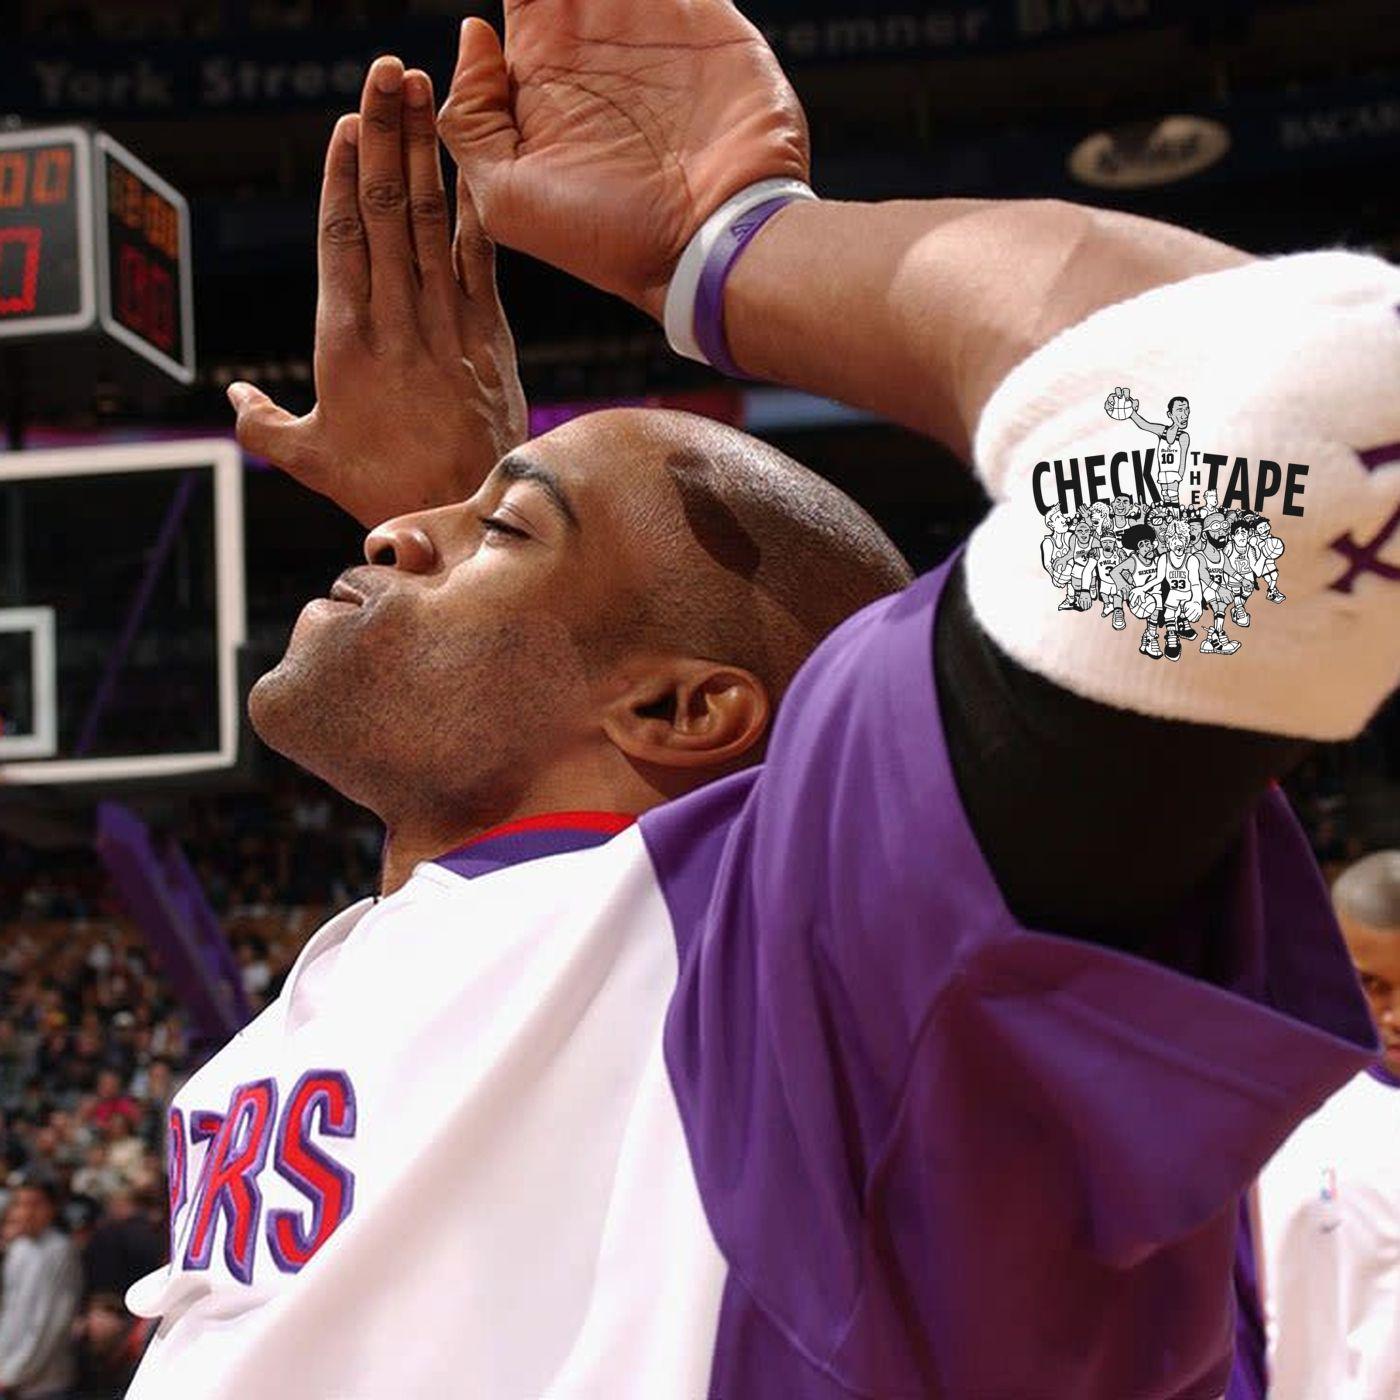 Episode 78: Kristaps Porzingis Trade Reaction, Toronto Raptors vs Phoenix Suns in 2000